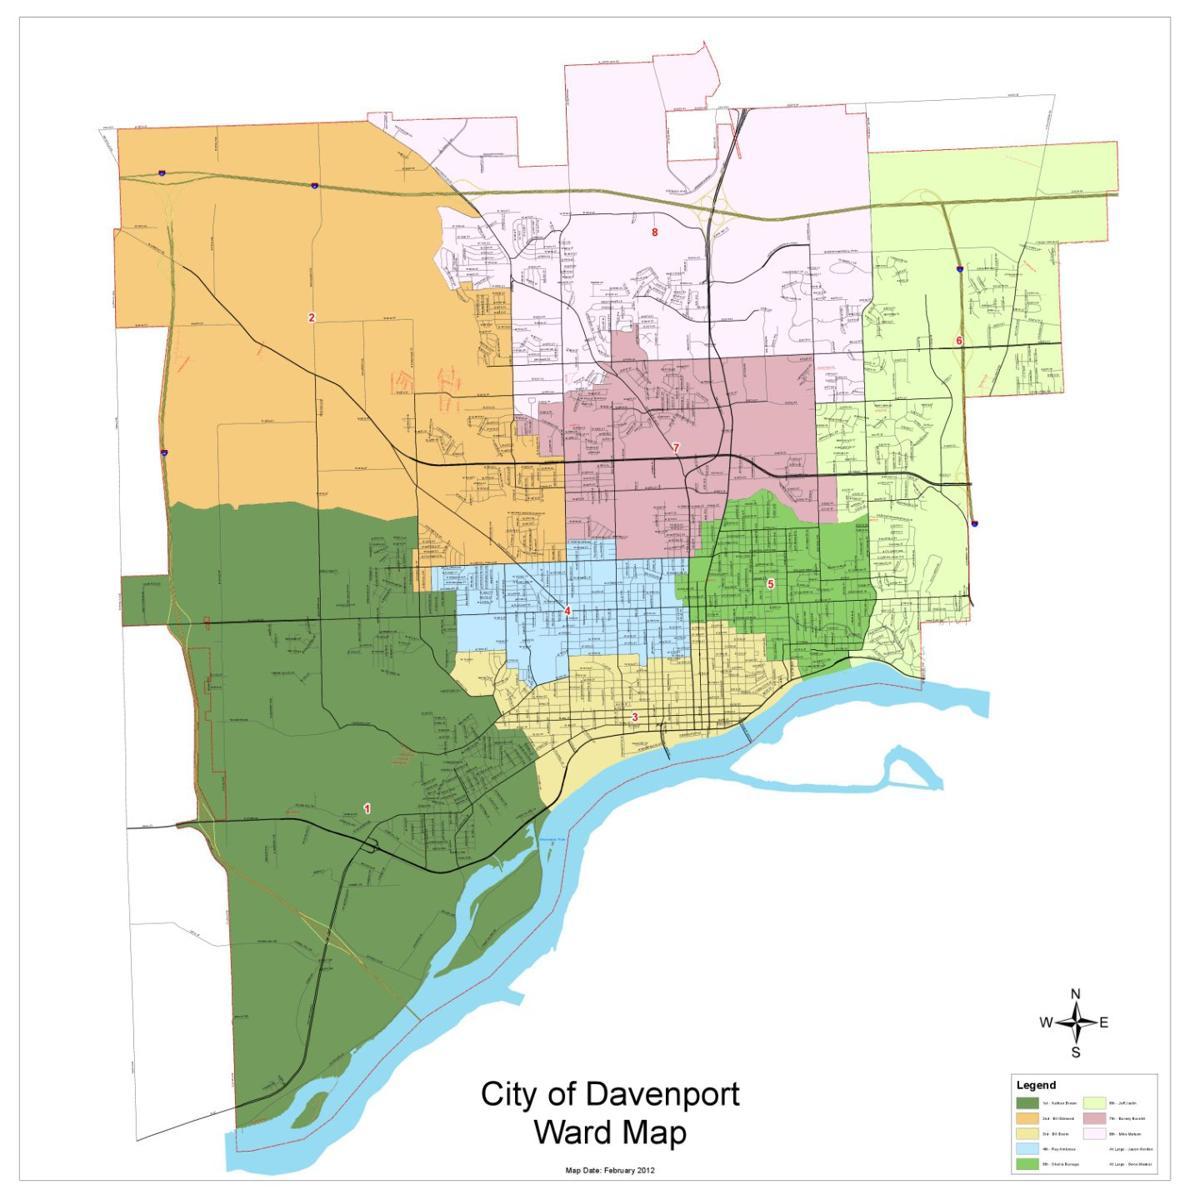 Davenport Wards map | | qctimes.com on iowa river iowa map, stockton iowa map, iowa state map, jackson iowa map, lacrosse iowa map, aplington iowa map, dundee iowa map, shueyville iowa map, quad cities map, kansas iowa map, norfolk iowa map, iowa county map, chester iowa map, clemons iowa map, cheyenne iowa map, dubuque iowa map, interstate 80 iowa map, bettendorf iowa map, clermont iowa map, council bluffs iowa map,